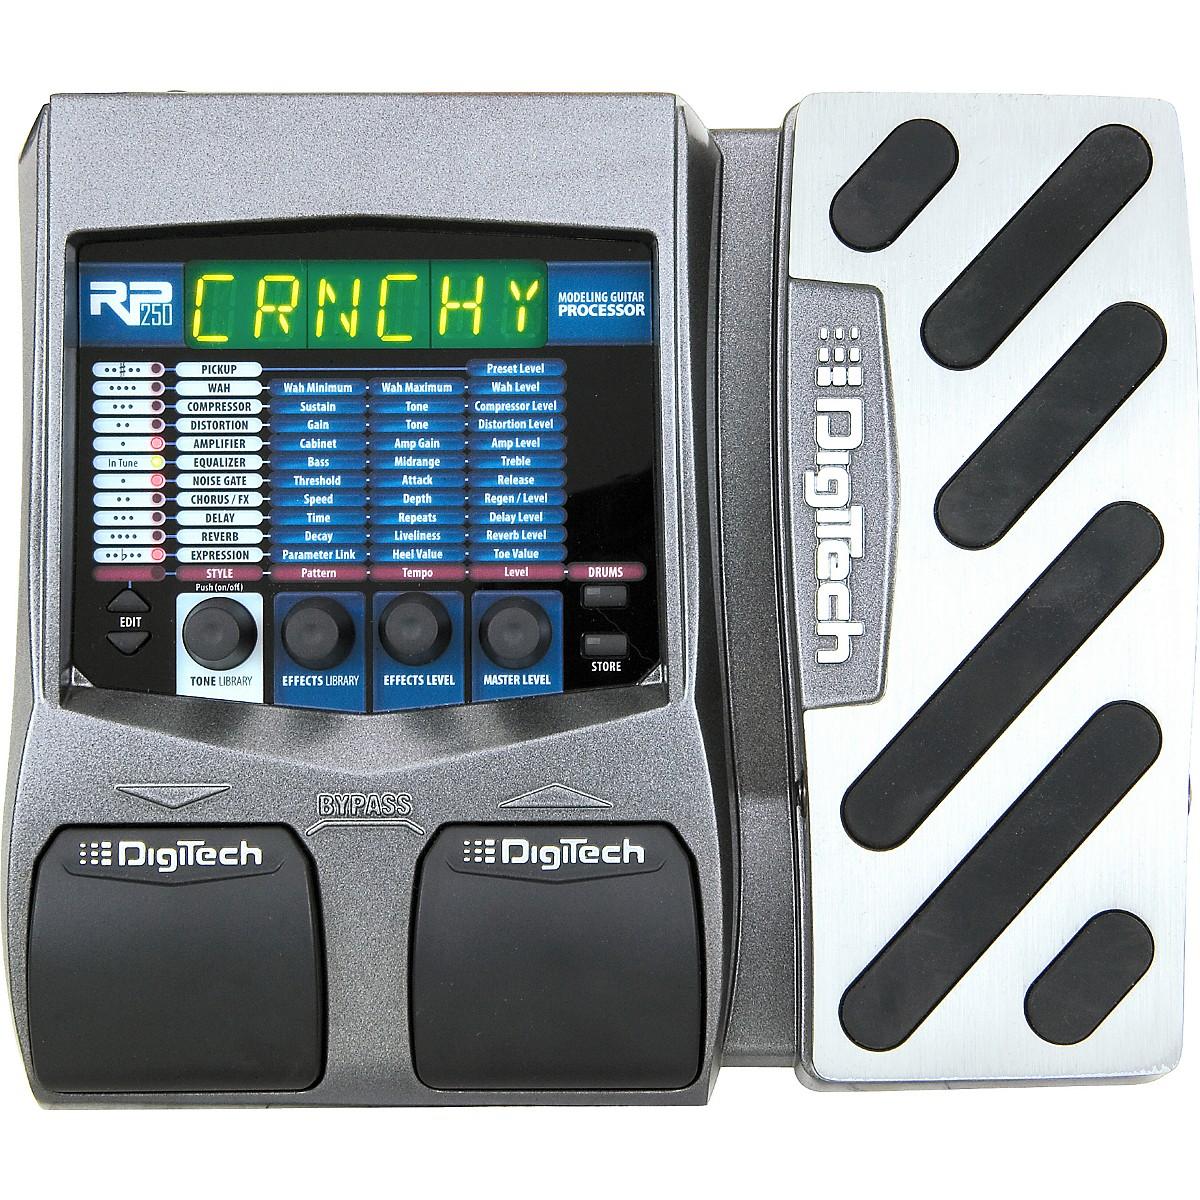 1000 PRESETS DIGITECH RP250 GUITAR PROCESSOR ARTIST PATCHES EFFECTS AMPS